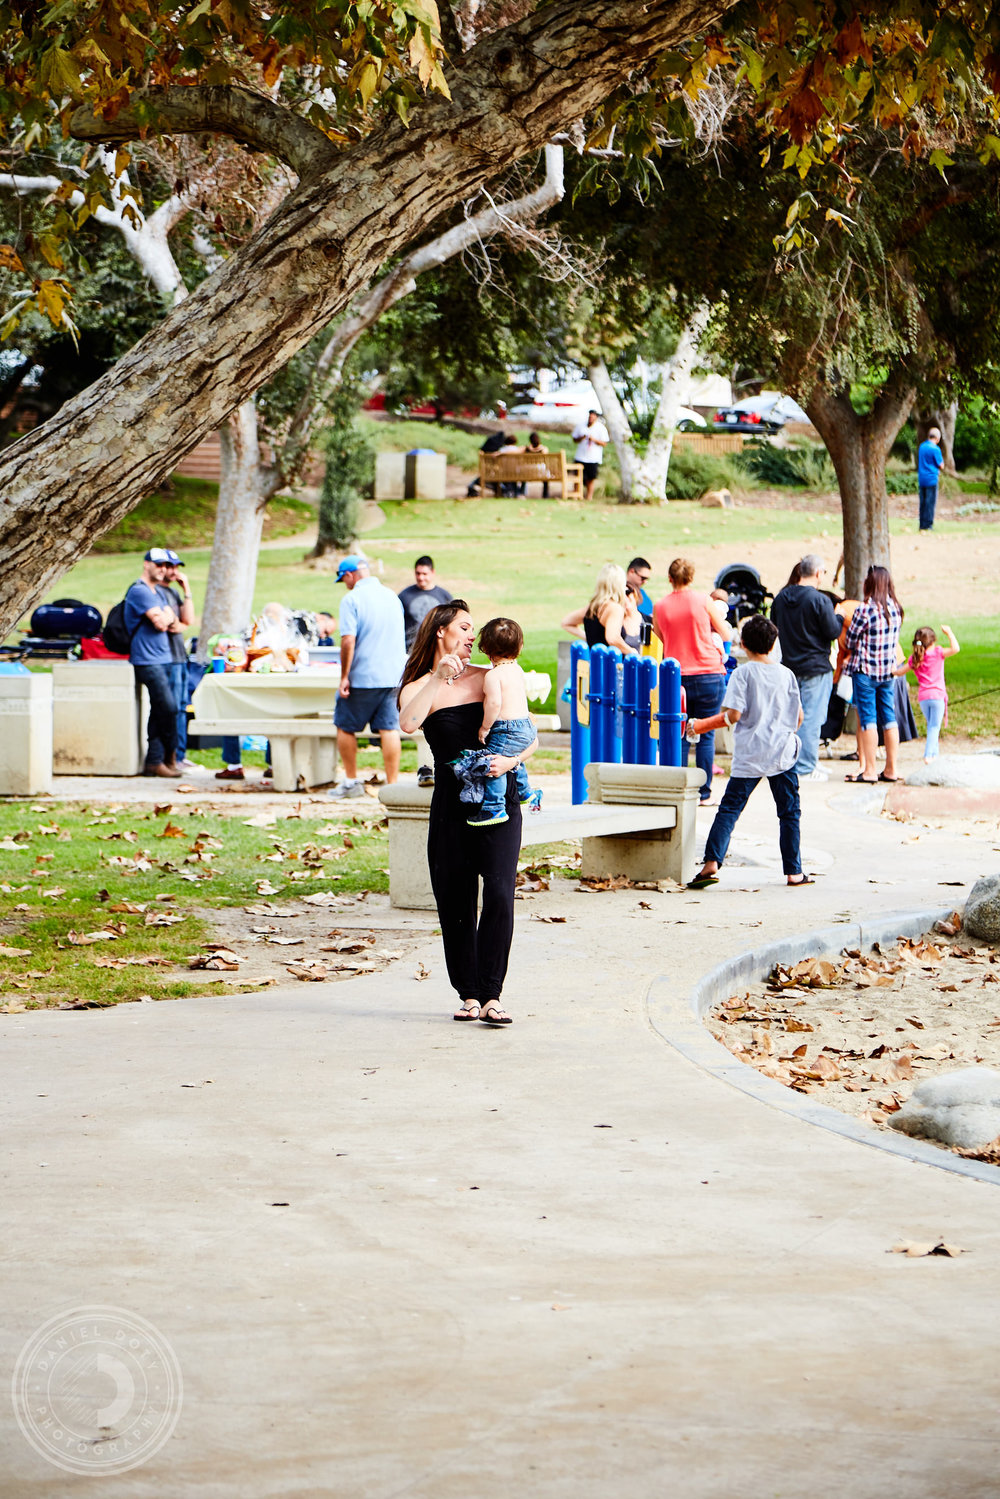 Valley Park Hermosa Beach 1st Birthday Photography Daniel Doty Photography 217.jpg